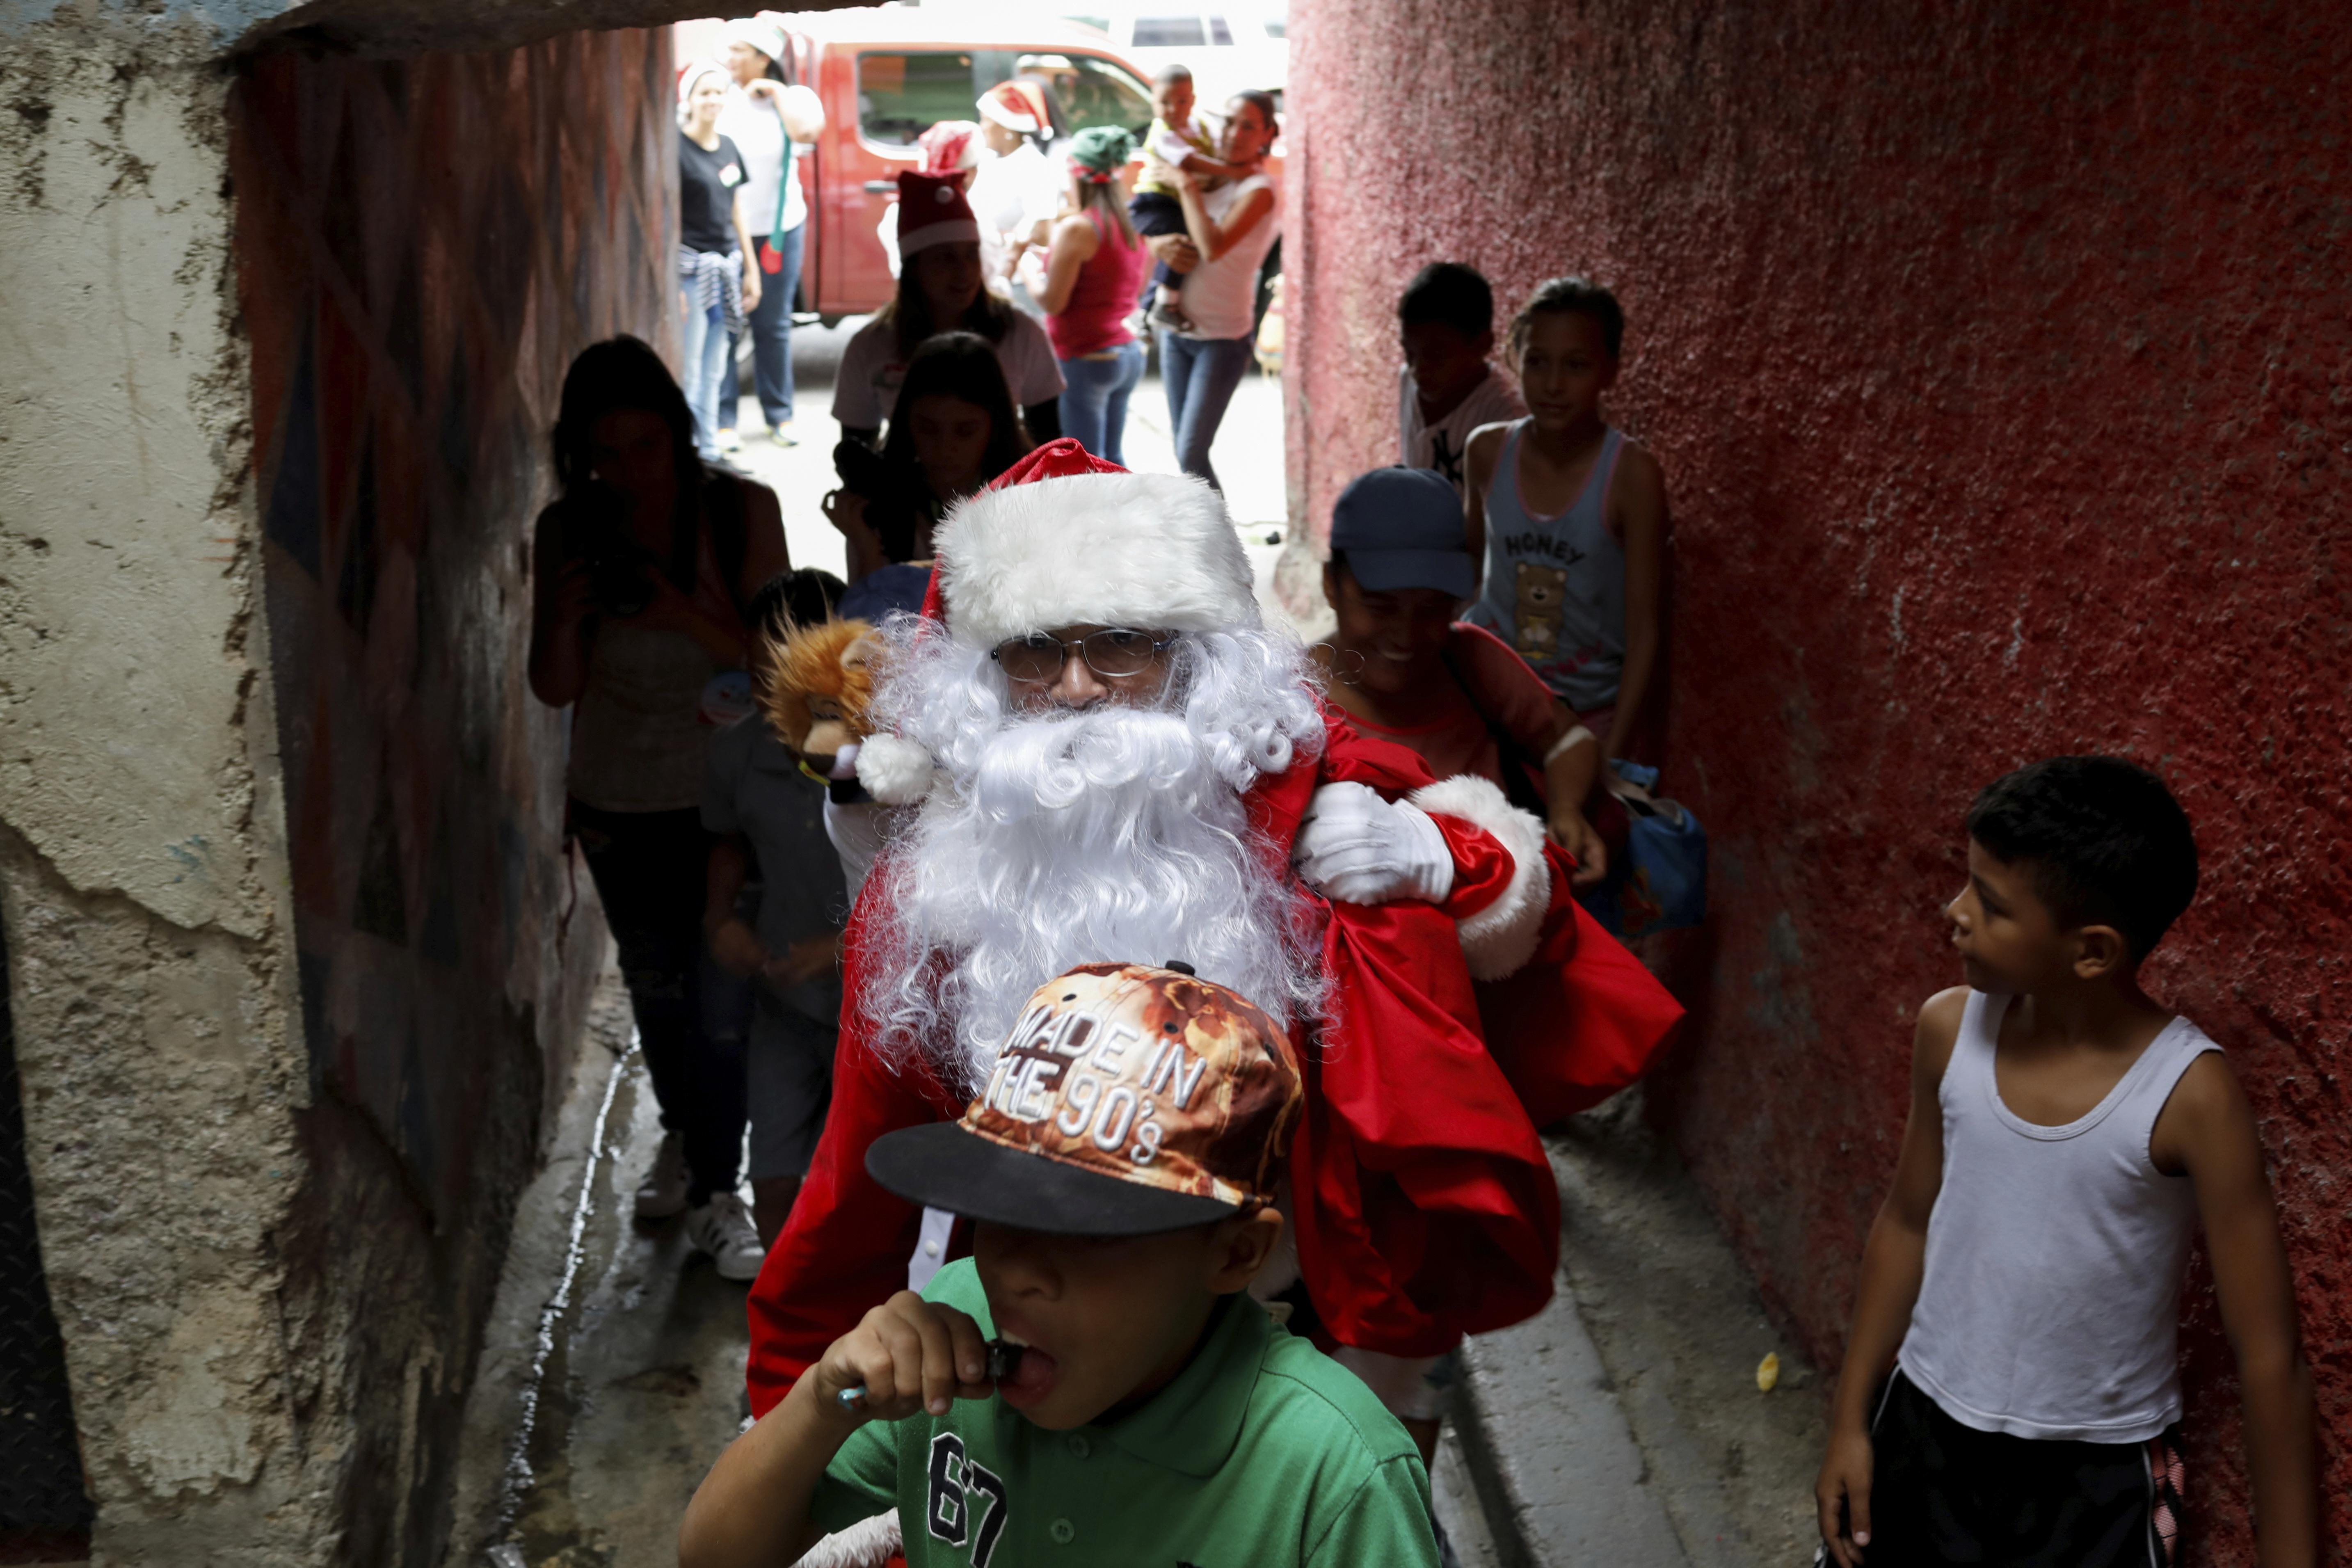 Richard Gamboa, disfrazado de Santa Claus, reparte comida.